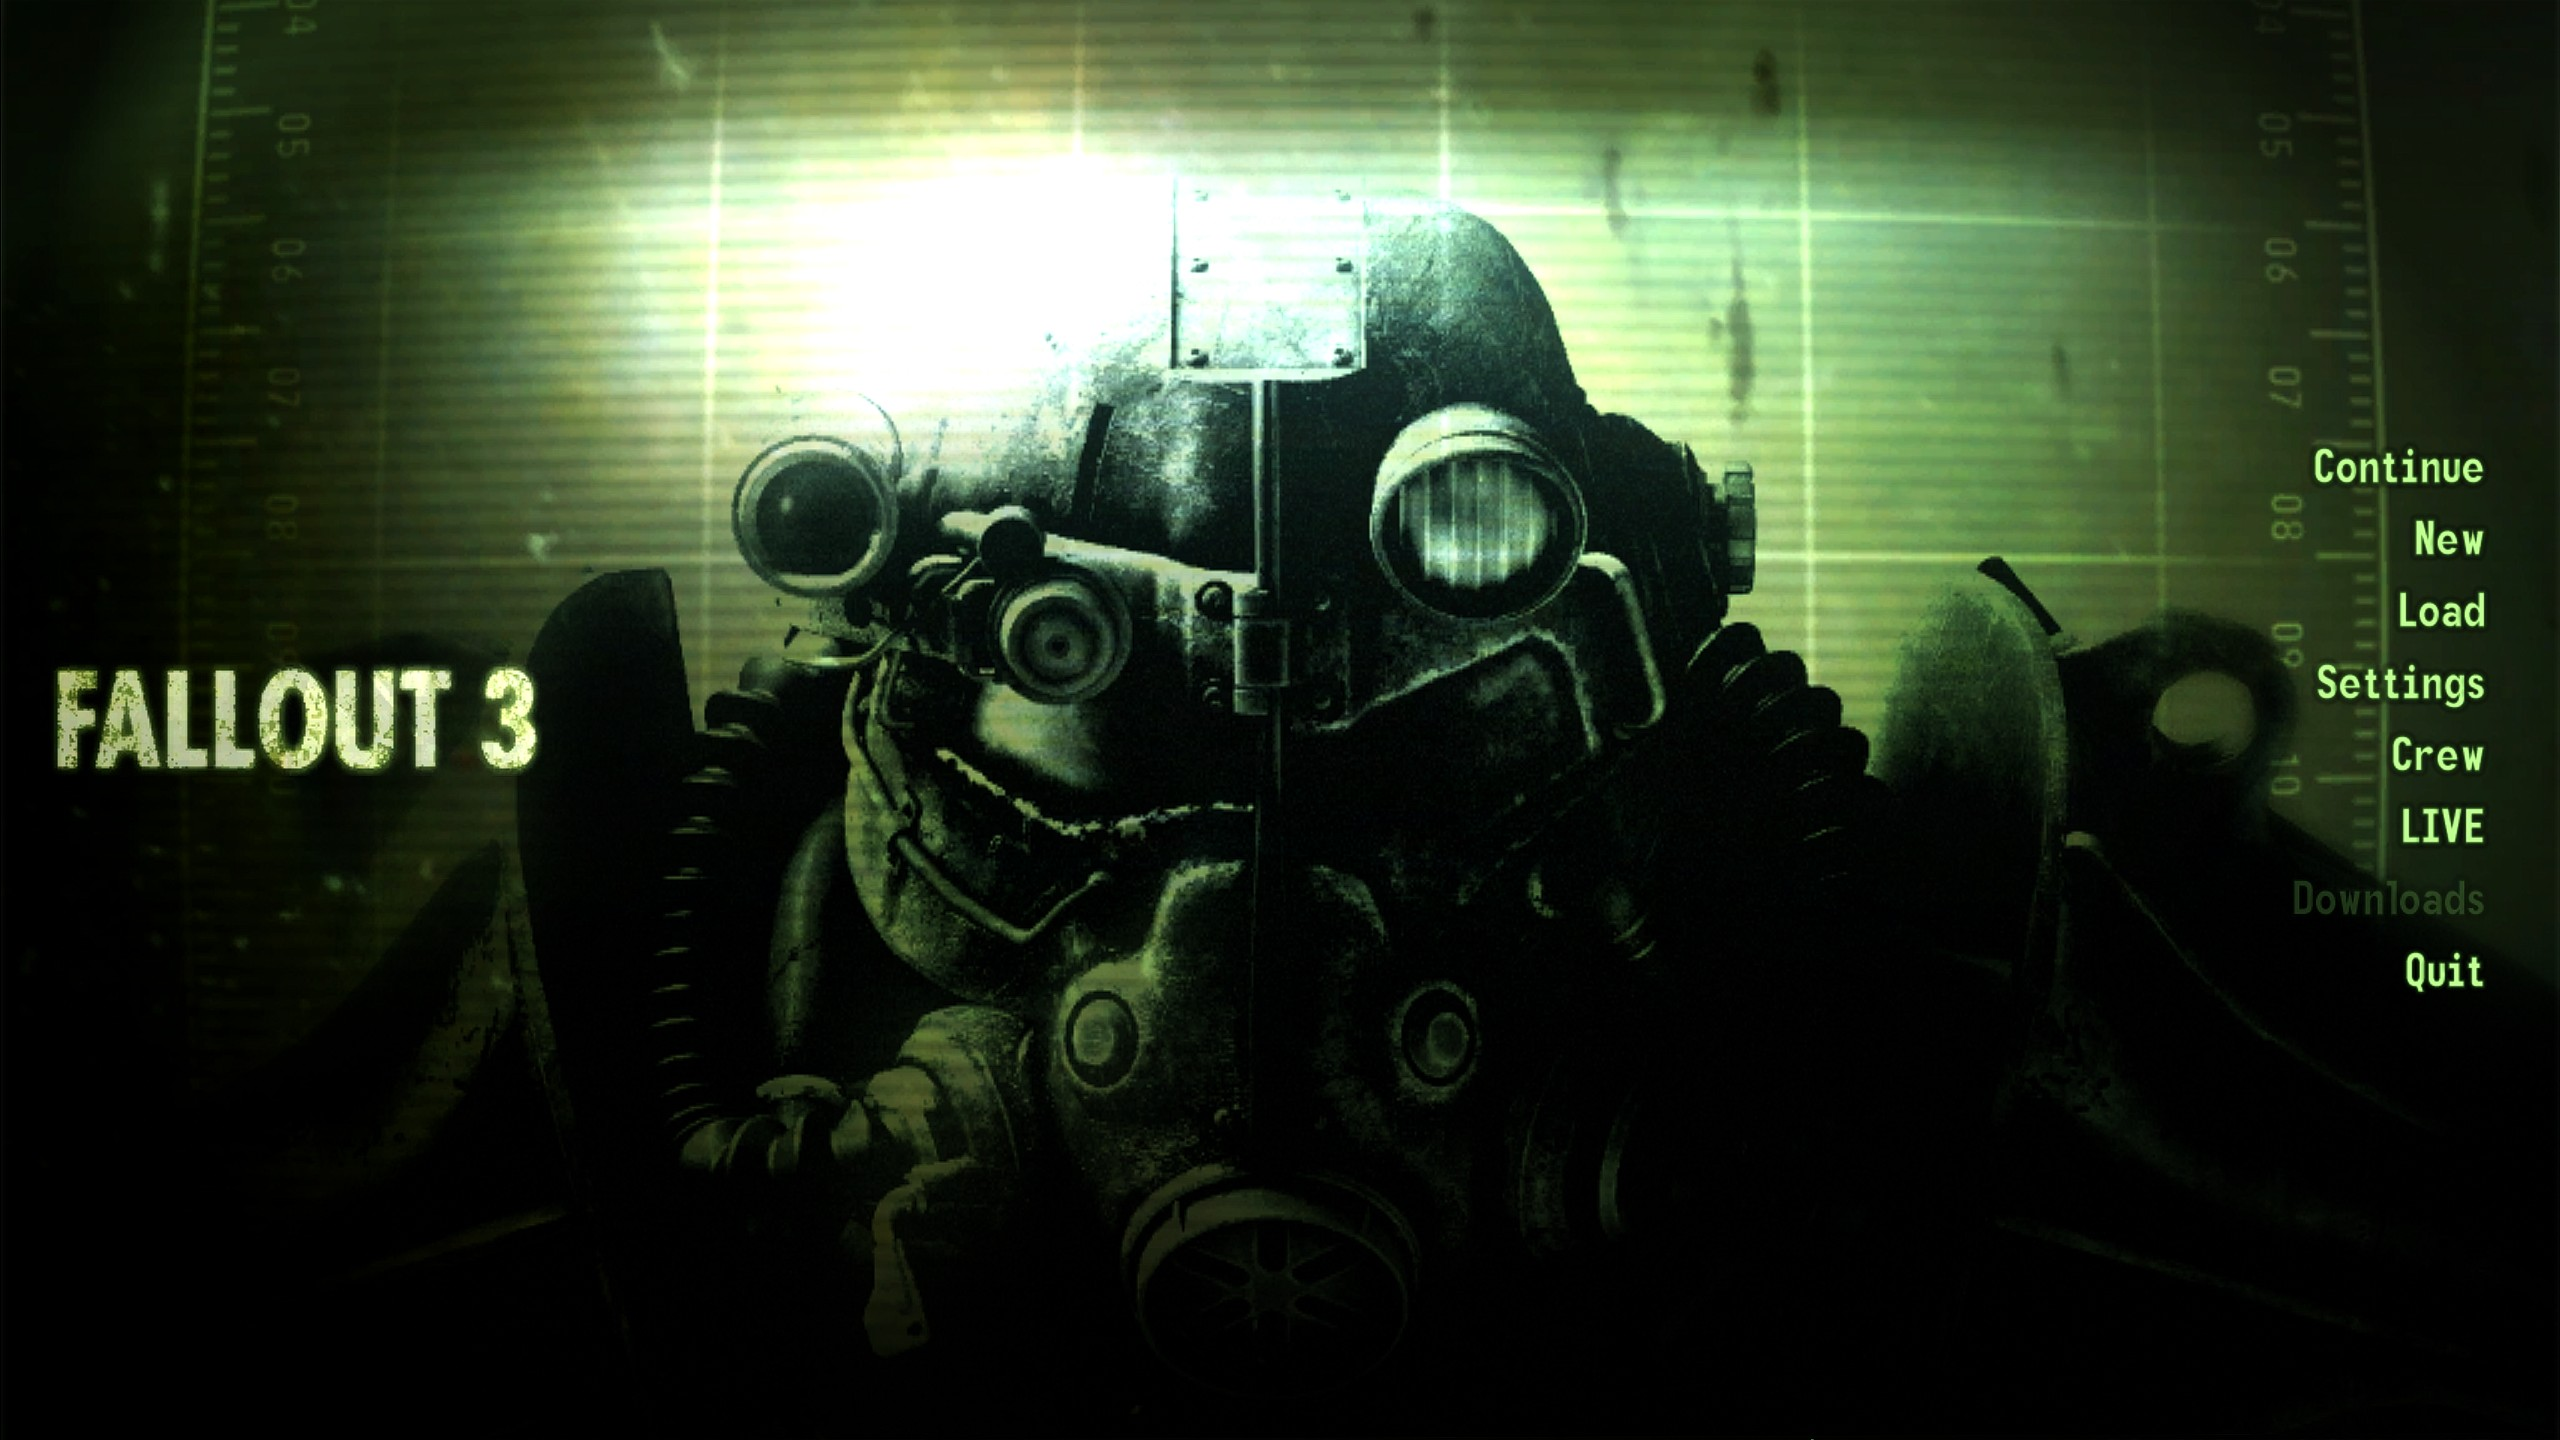 Fallout3 Nexus Mods And Community - oc-ubezpieczenia info